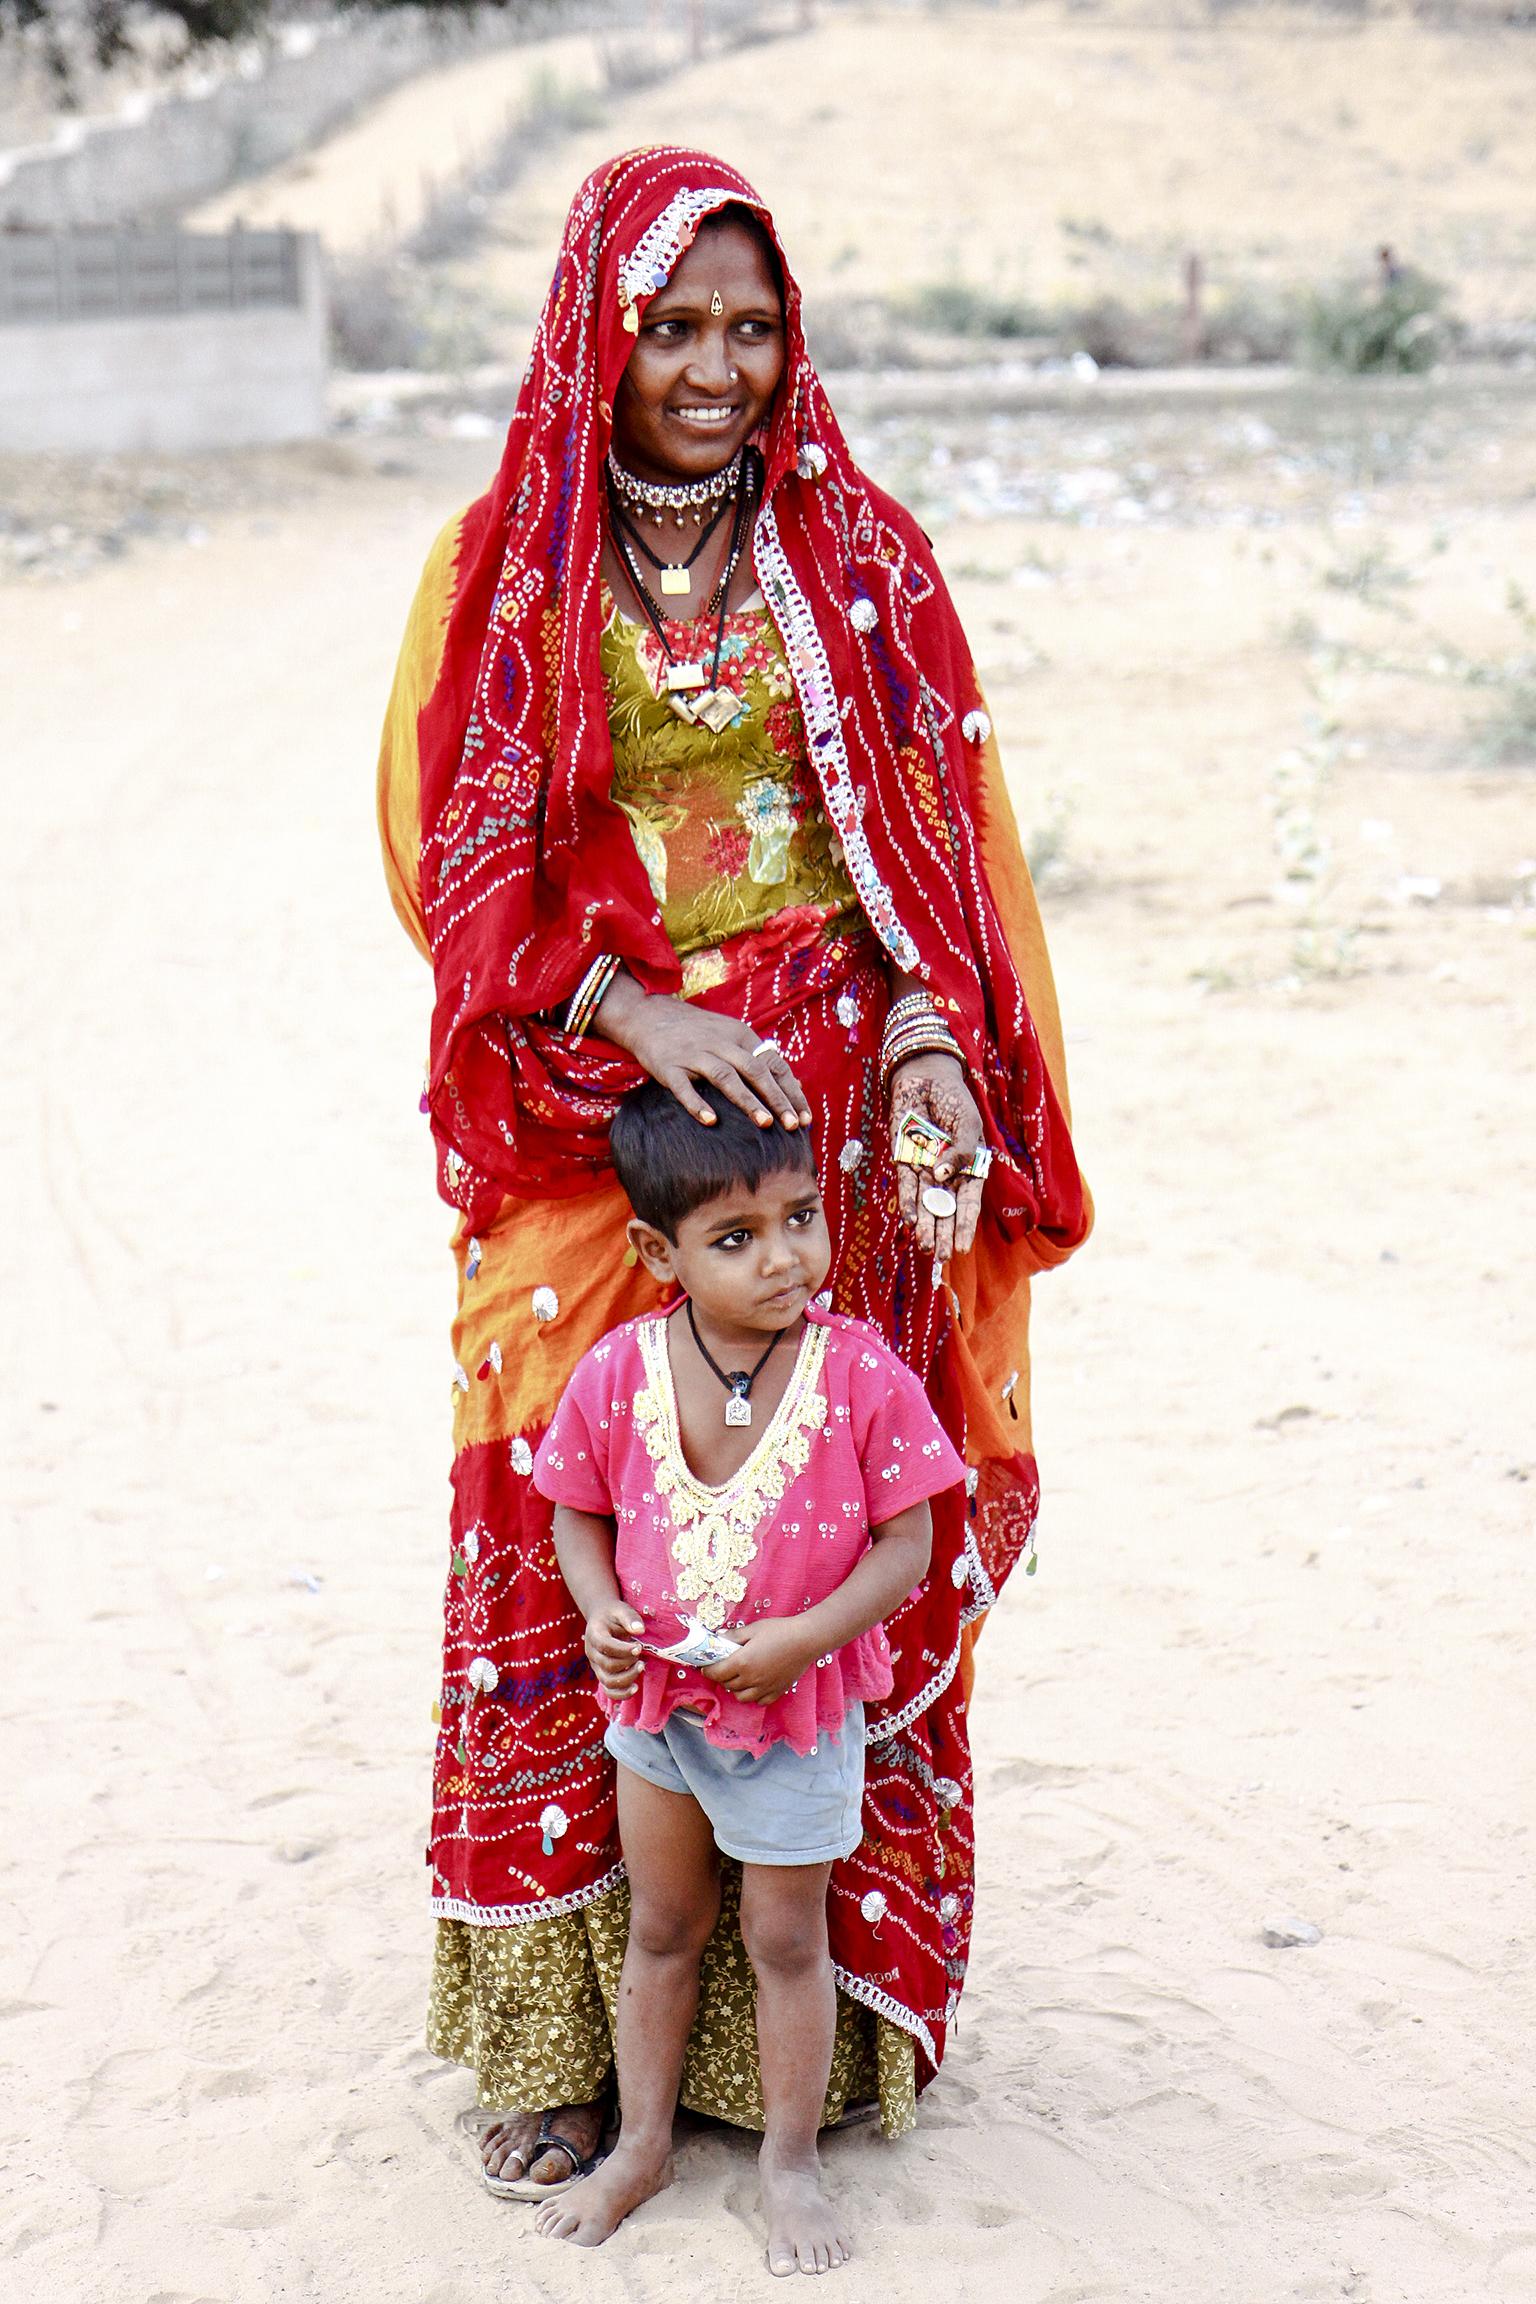 portraits-indien-inde-rajasthan-2010-marie-colette-becker-21